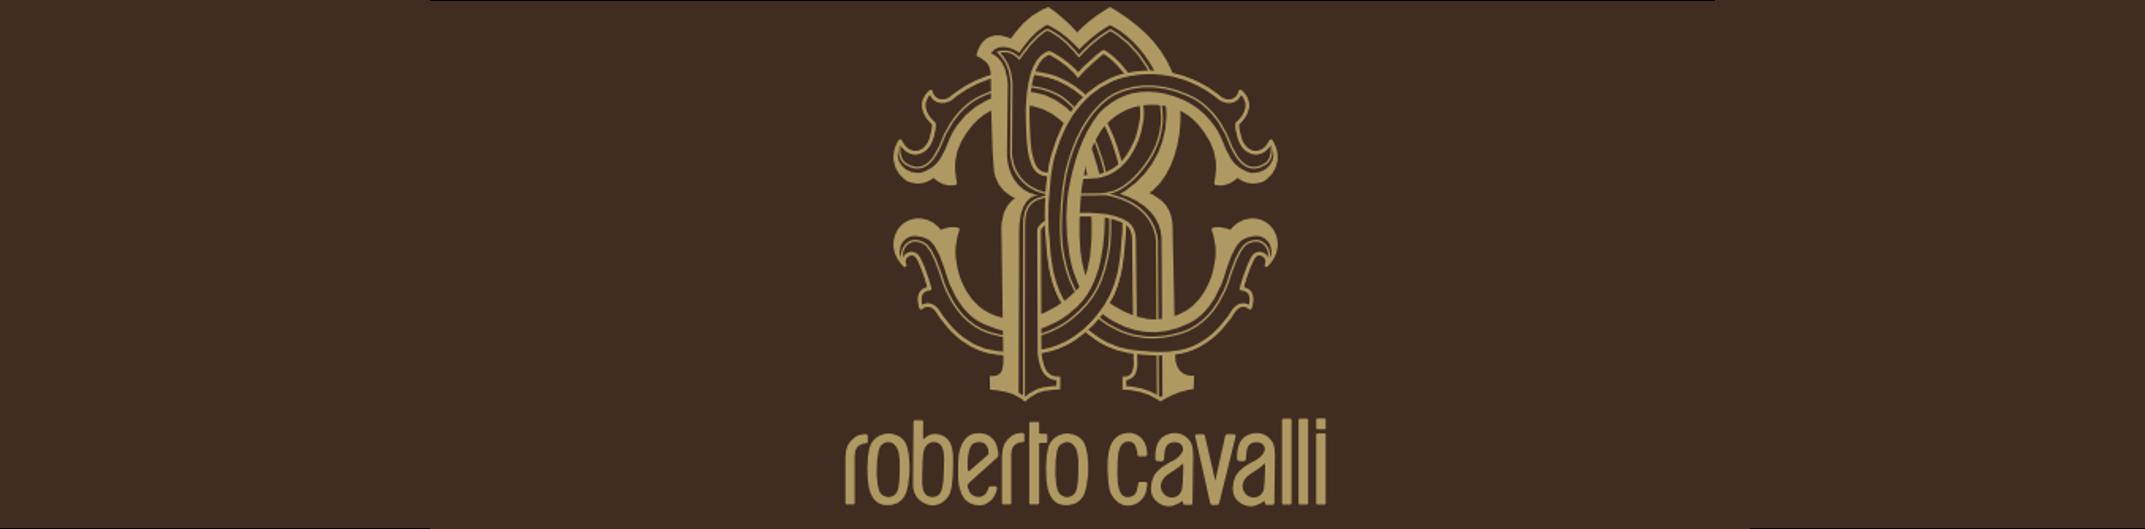 Roberto Cavalli Text